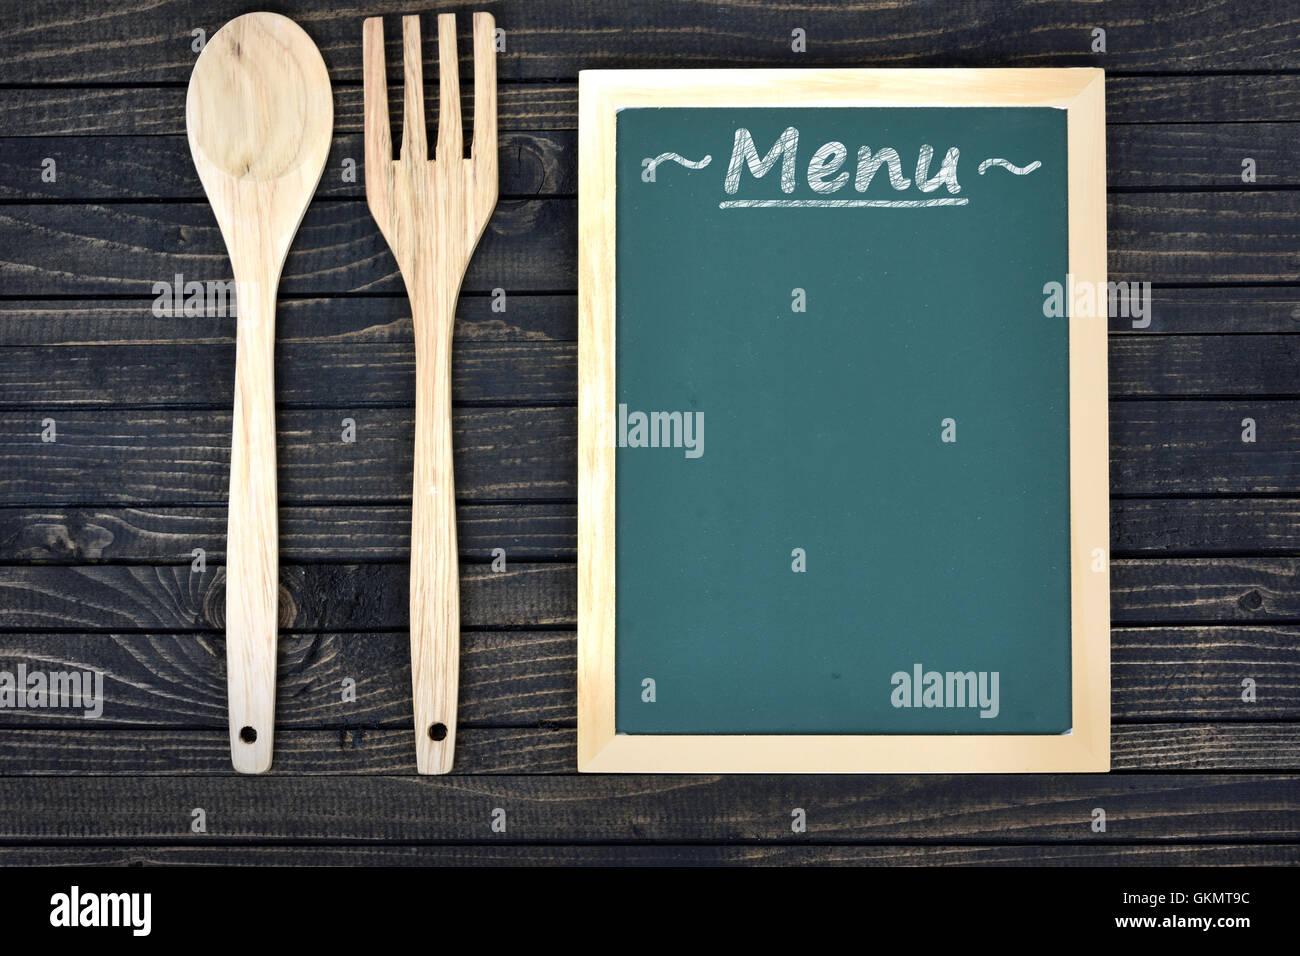 Board Frame Wood Fork Spoon Stock Photos & Board Frame Wood Fork ...